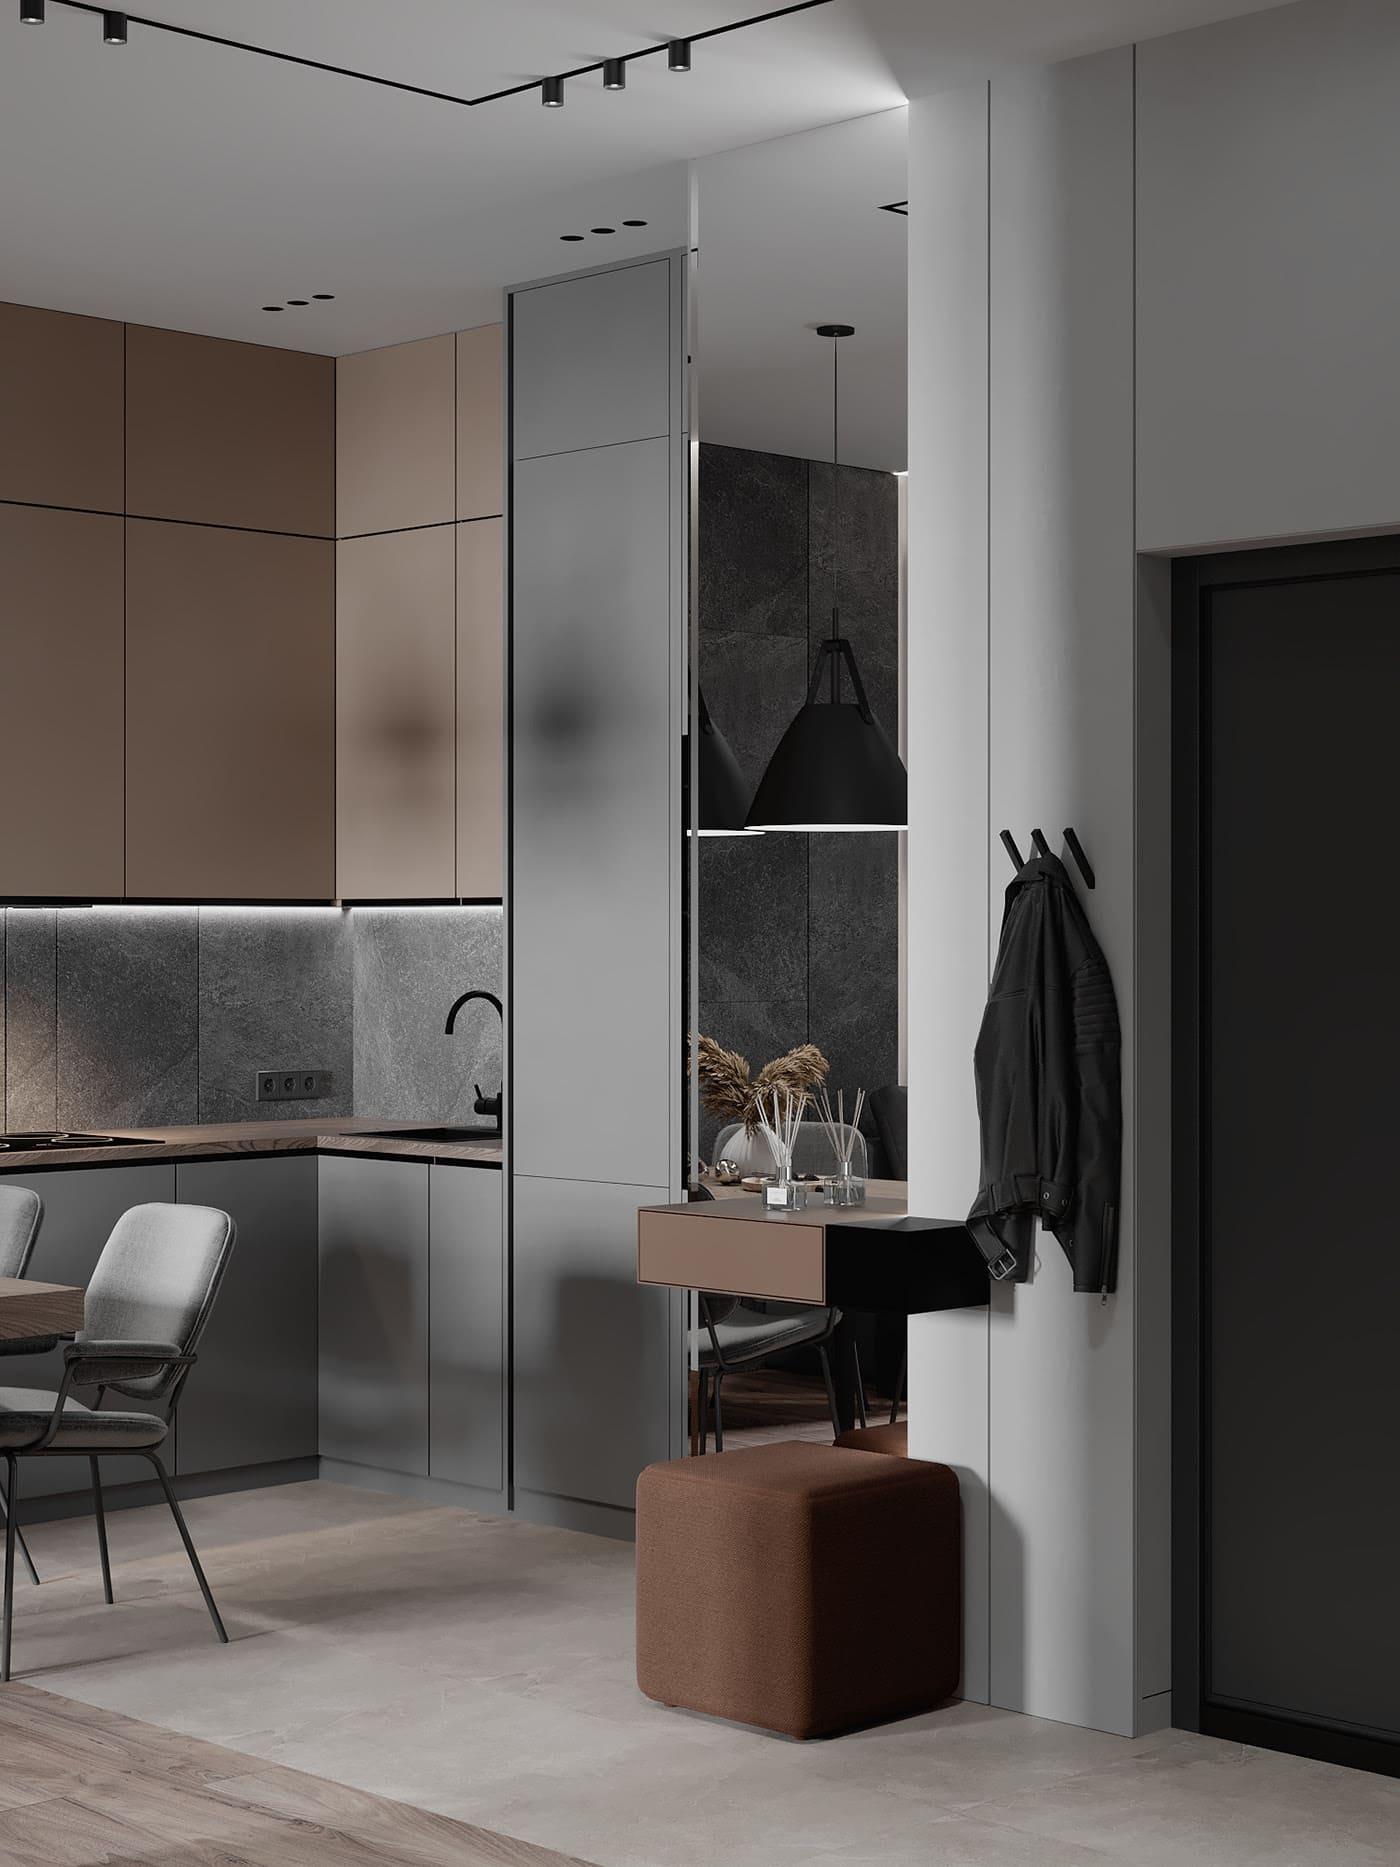 модный дизайн интерьера квартиры фото 2